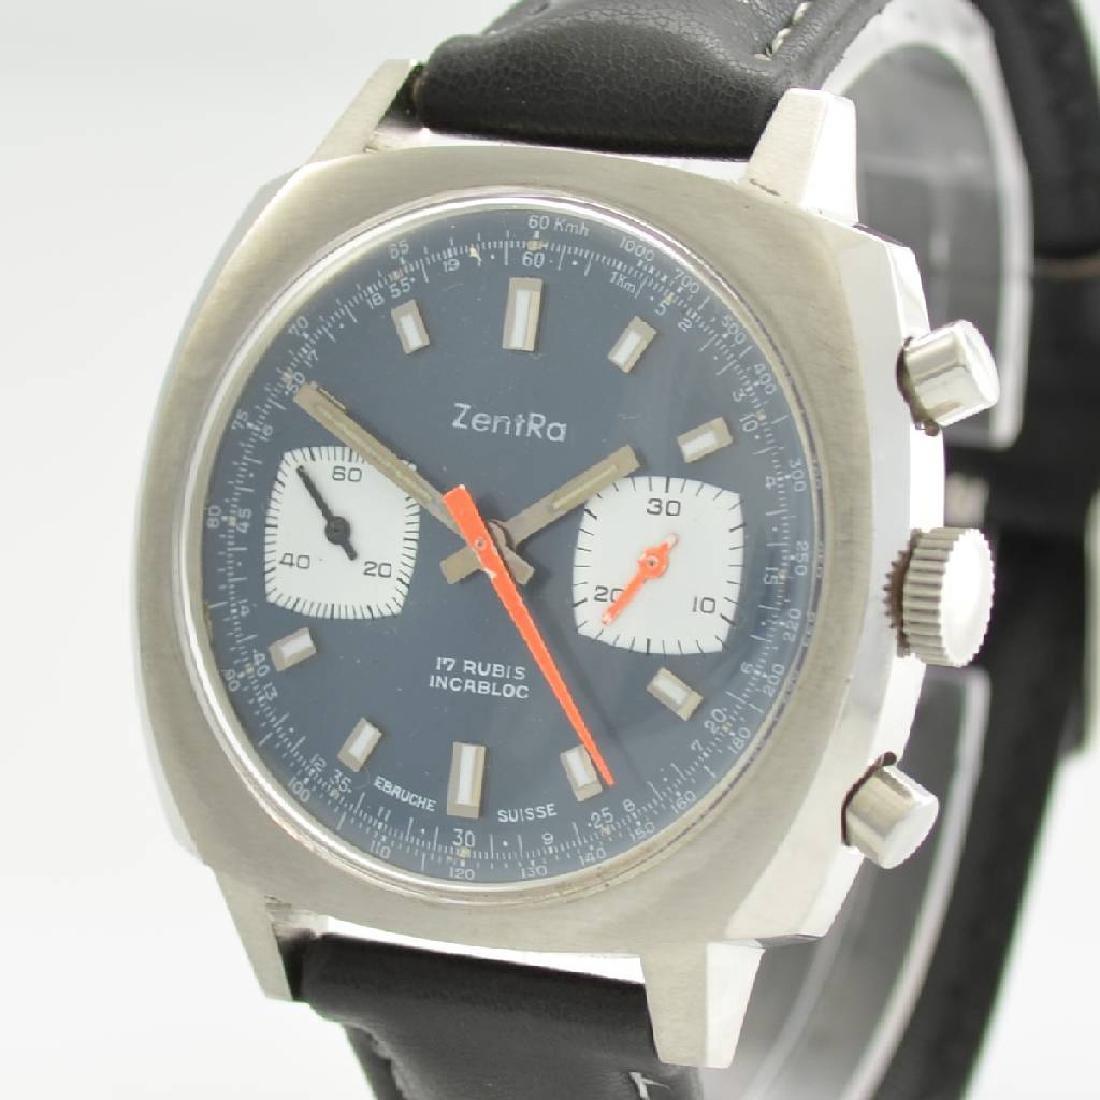 ZENTRA chronograph, Switzerland around 1970 - 4